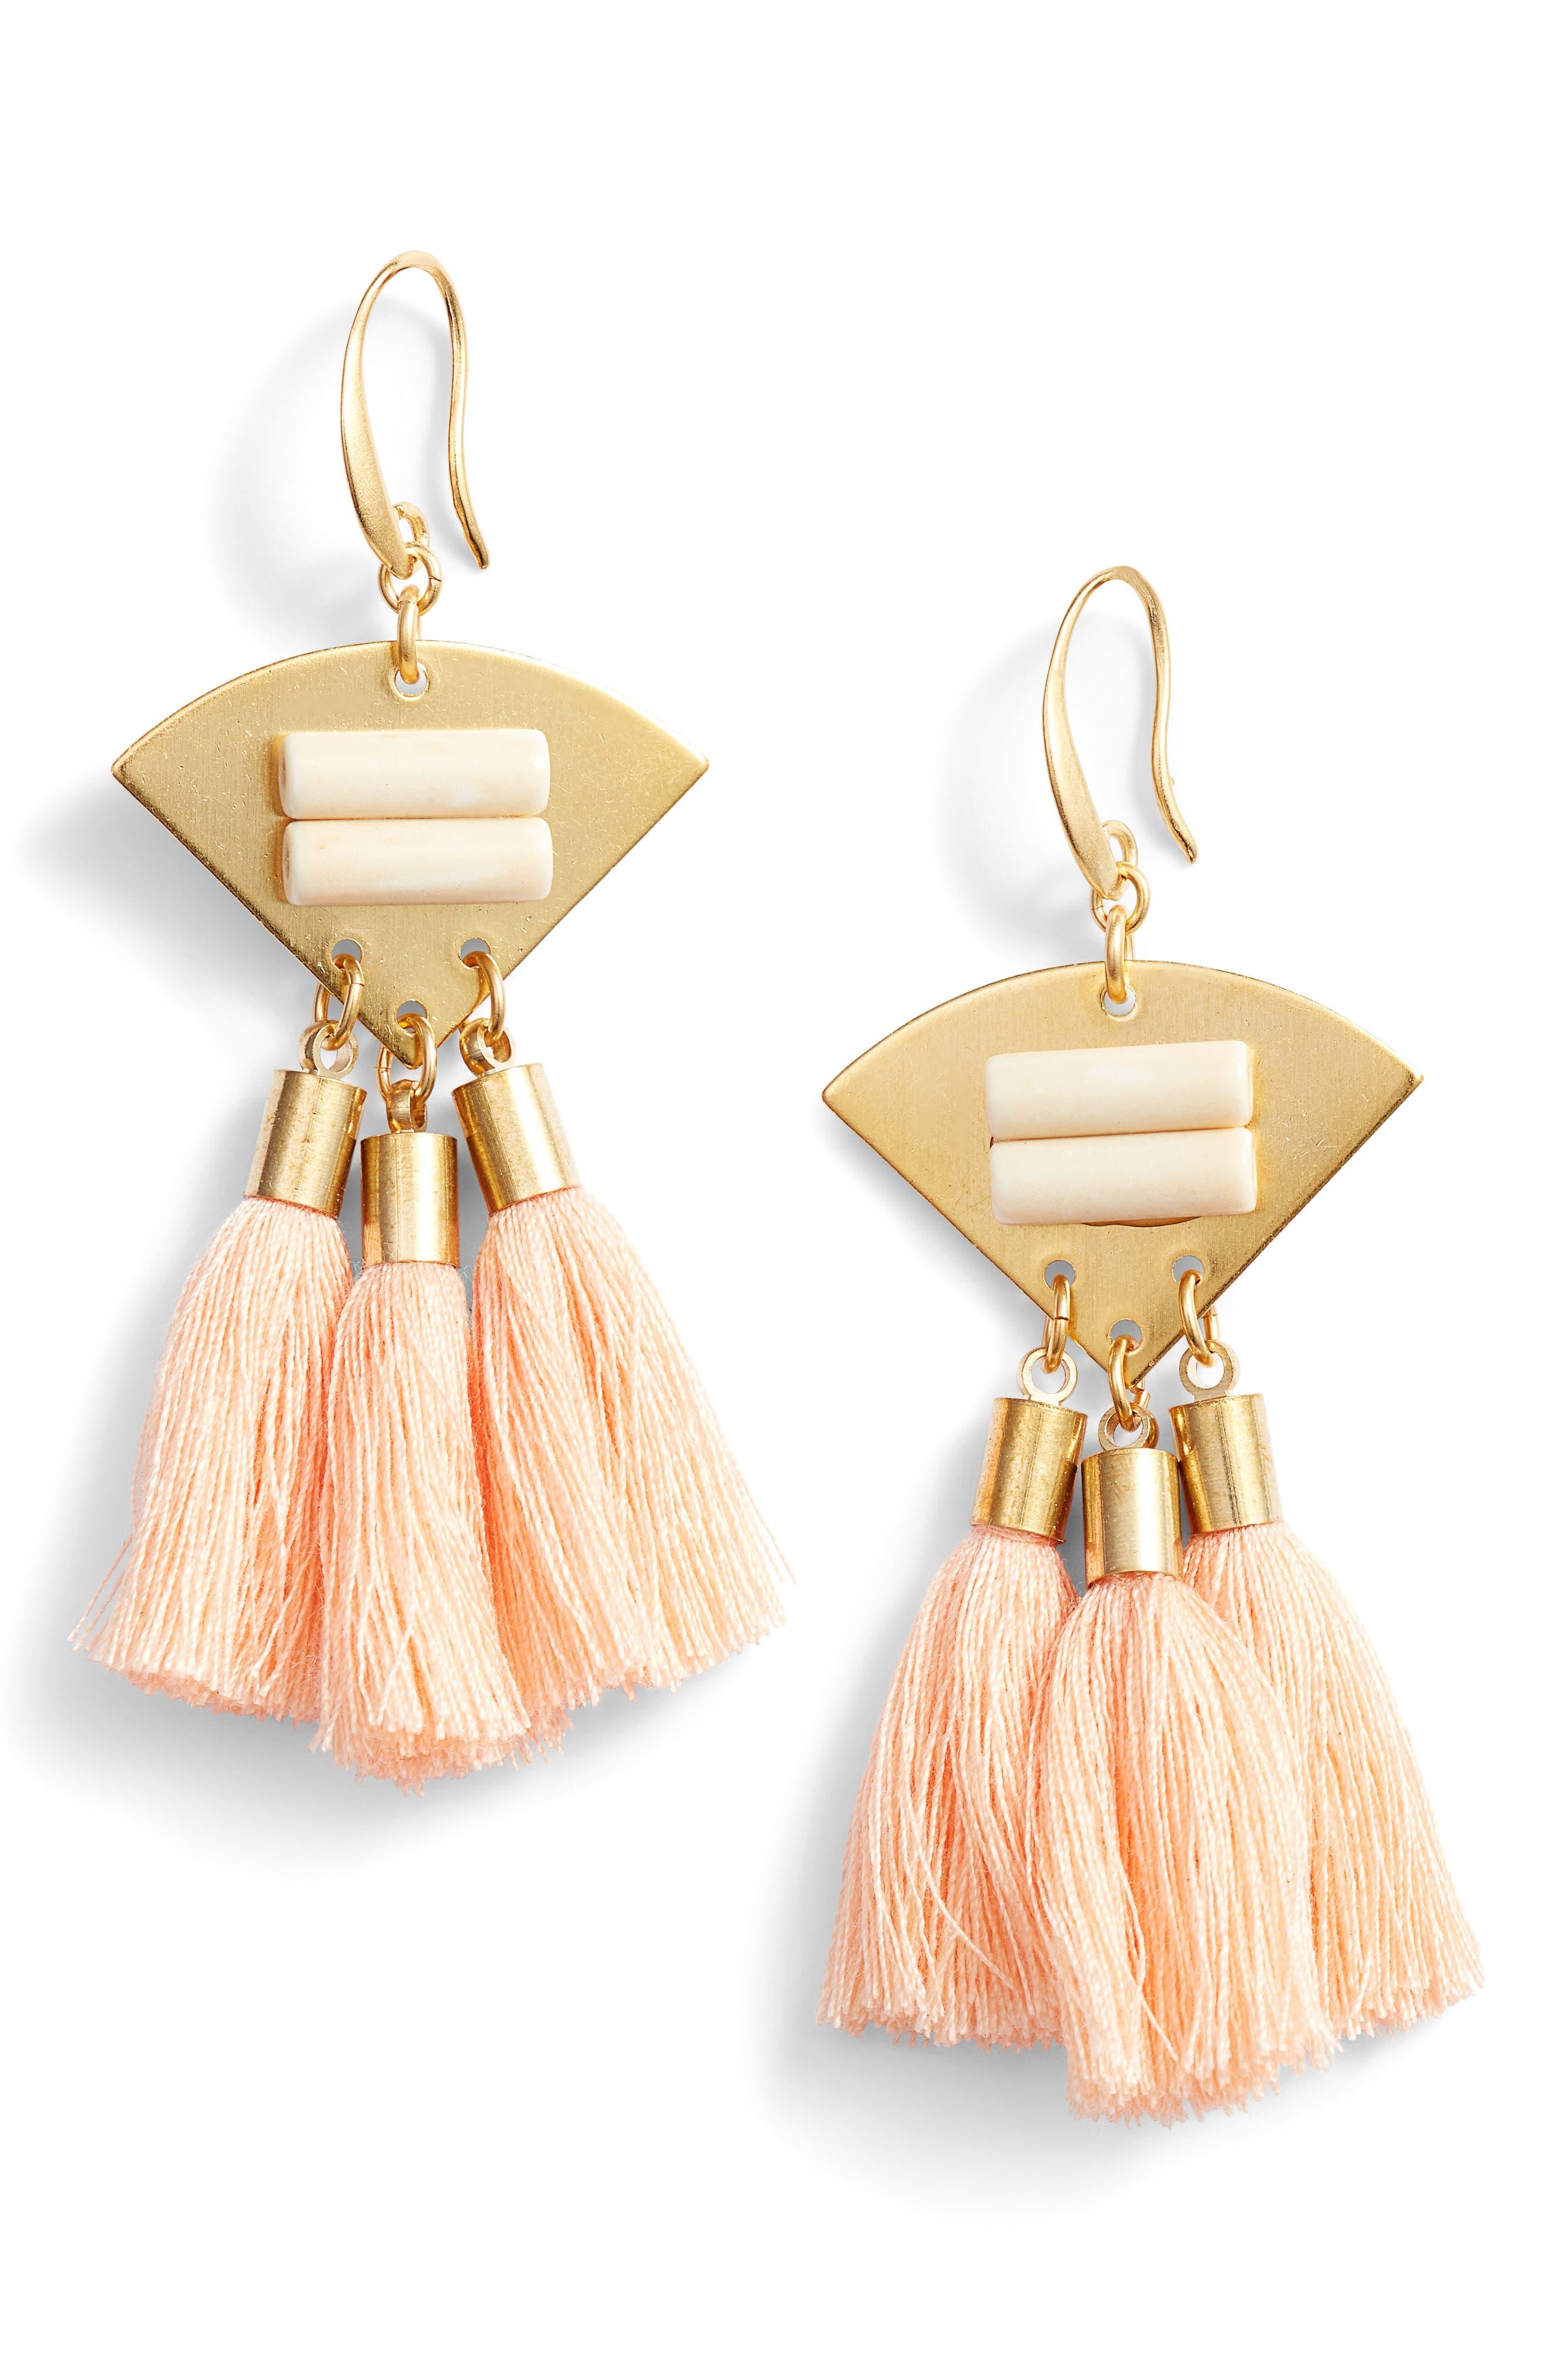 3-Tassel Earrings,                             Main thumbnail 1, color,                             Blush